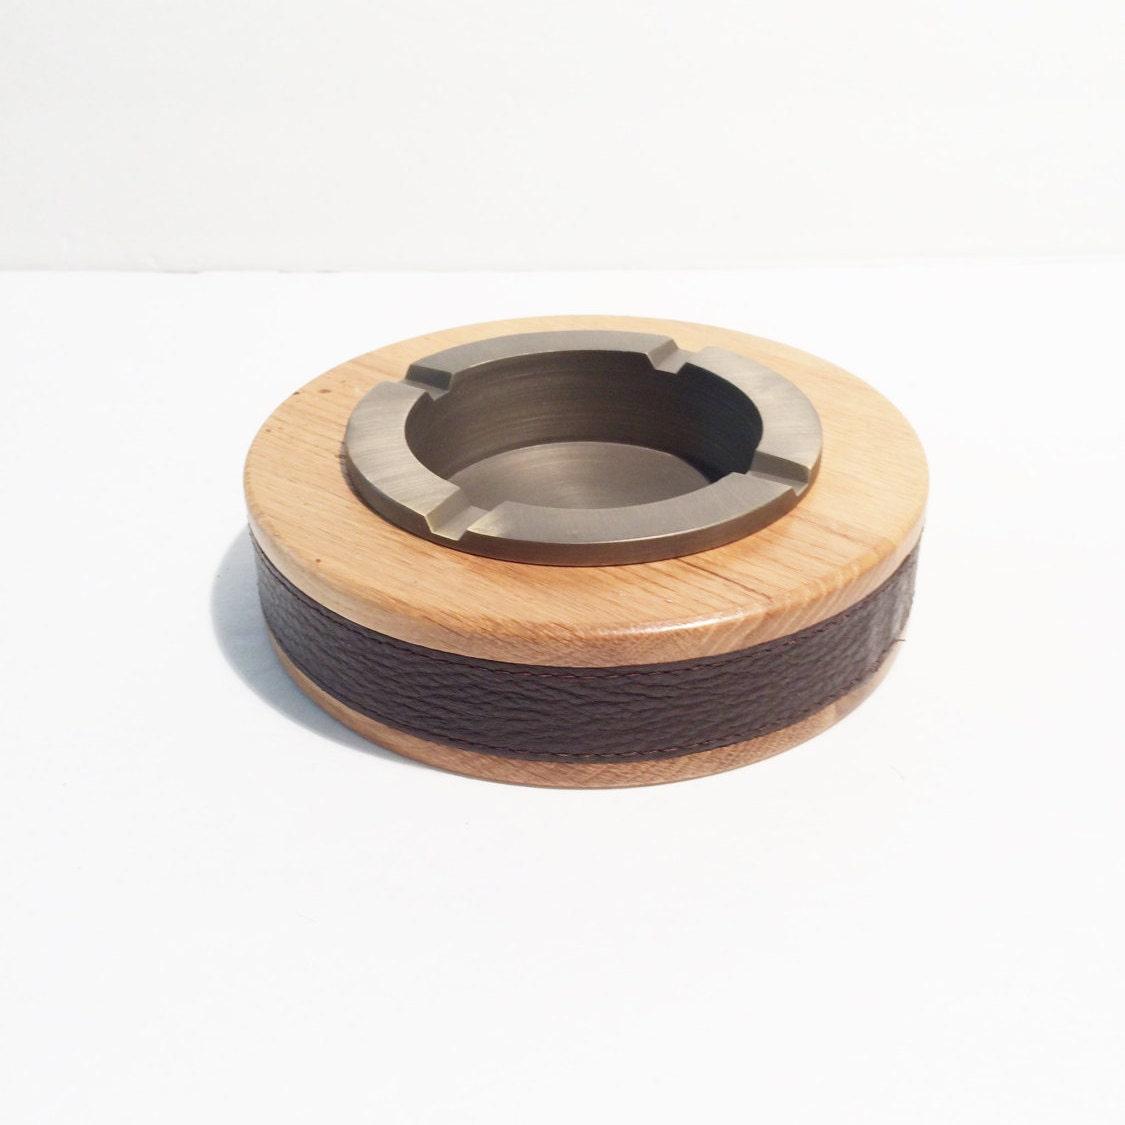 vintage wooden ashtray